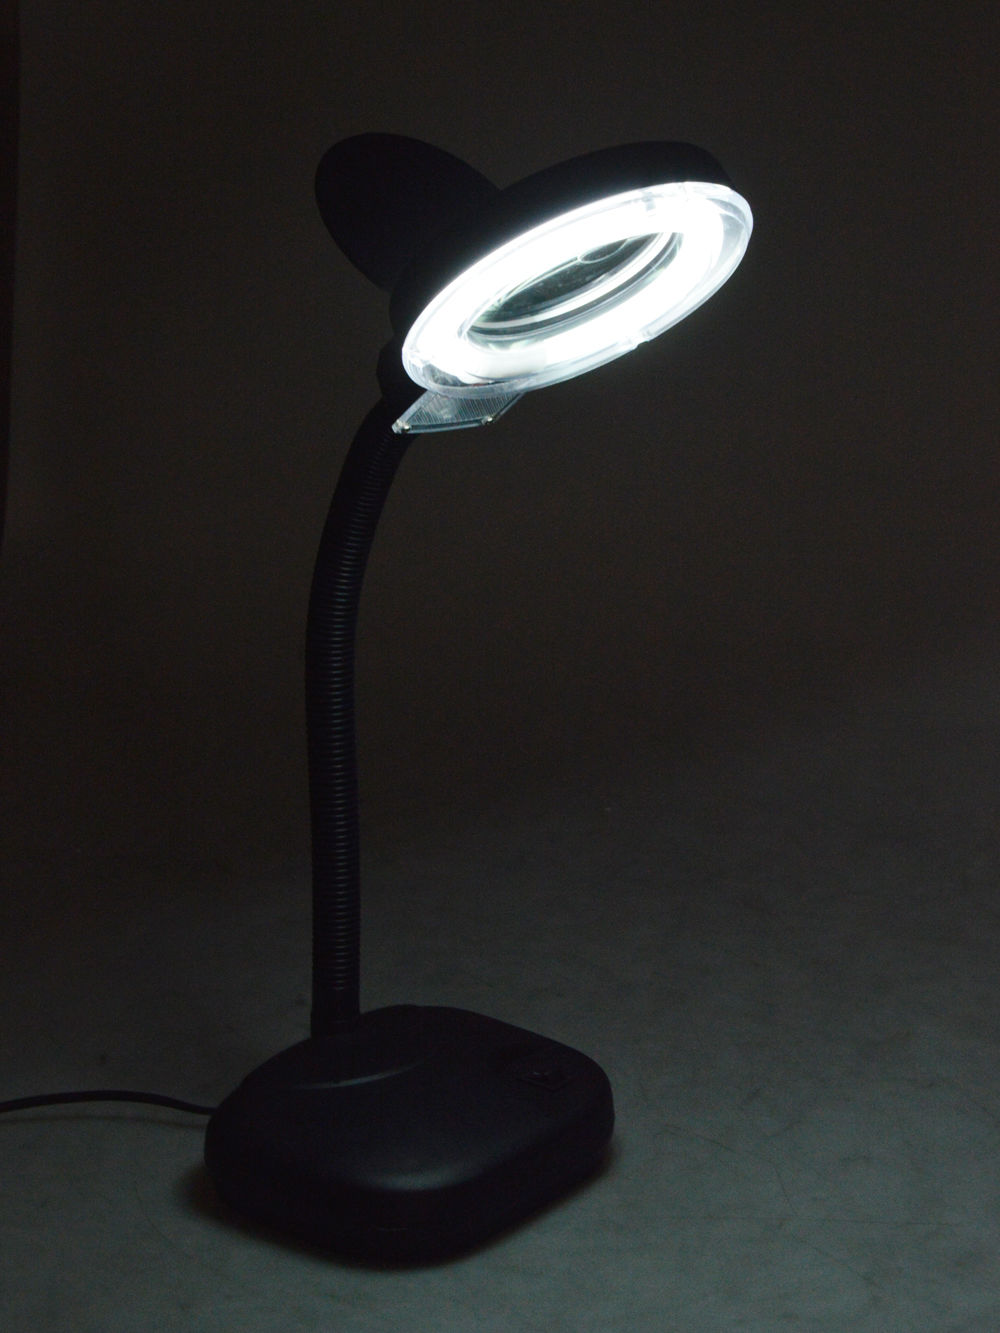 Black 5X 10X Tabletop Gooseneck Magnifying Magnifier Lamp